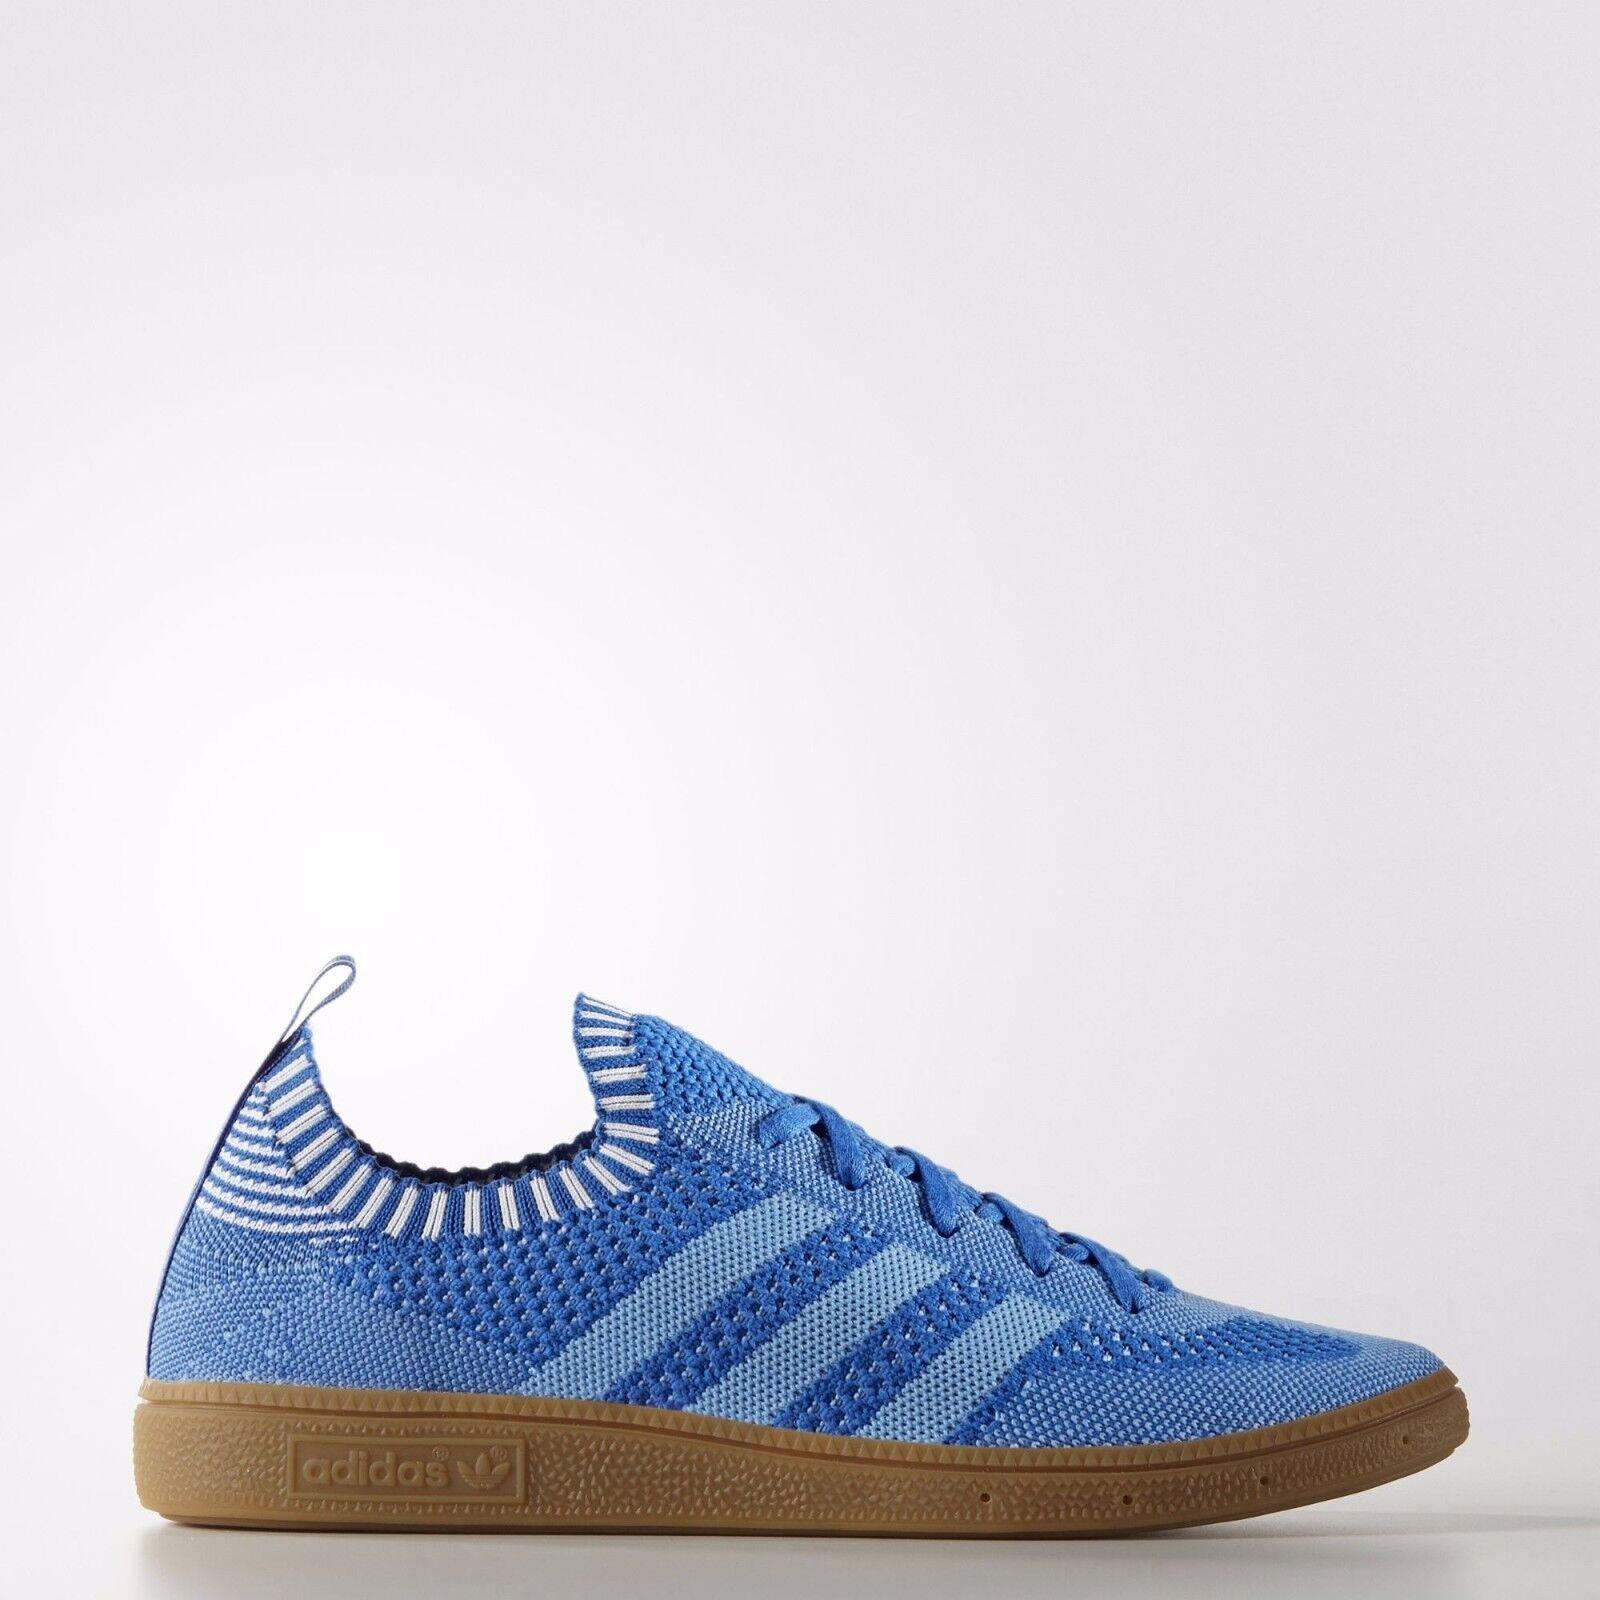 Adidas Very Spezial PK size 7.5. Primeknit Blue Gum S74843.  NMD boost